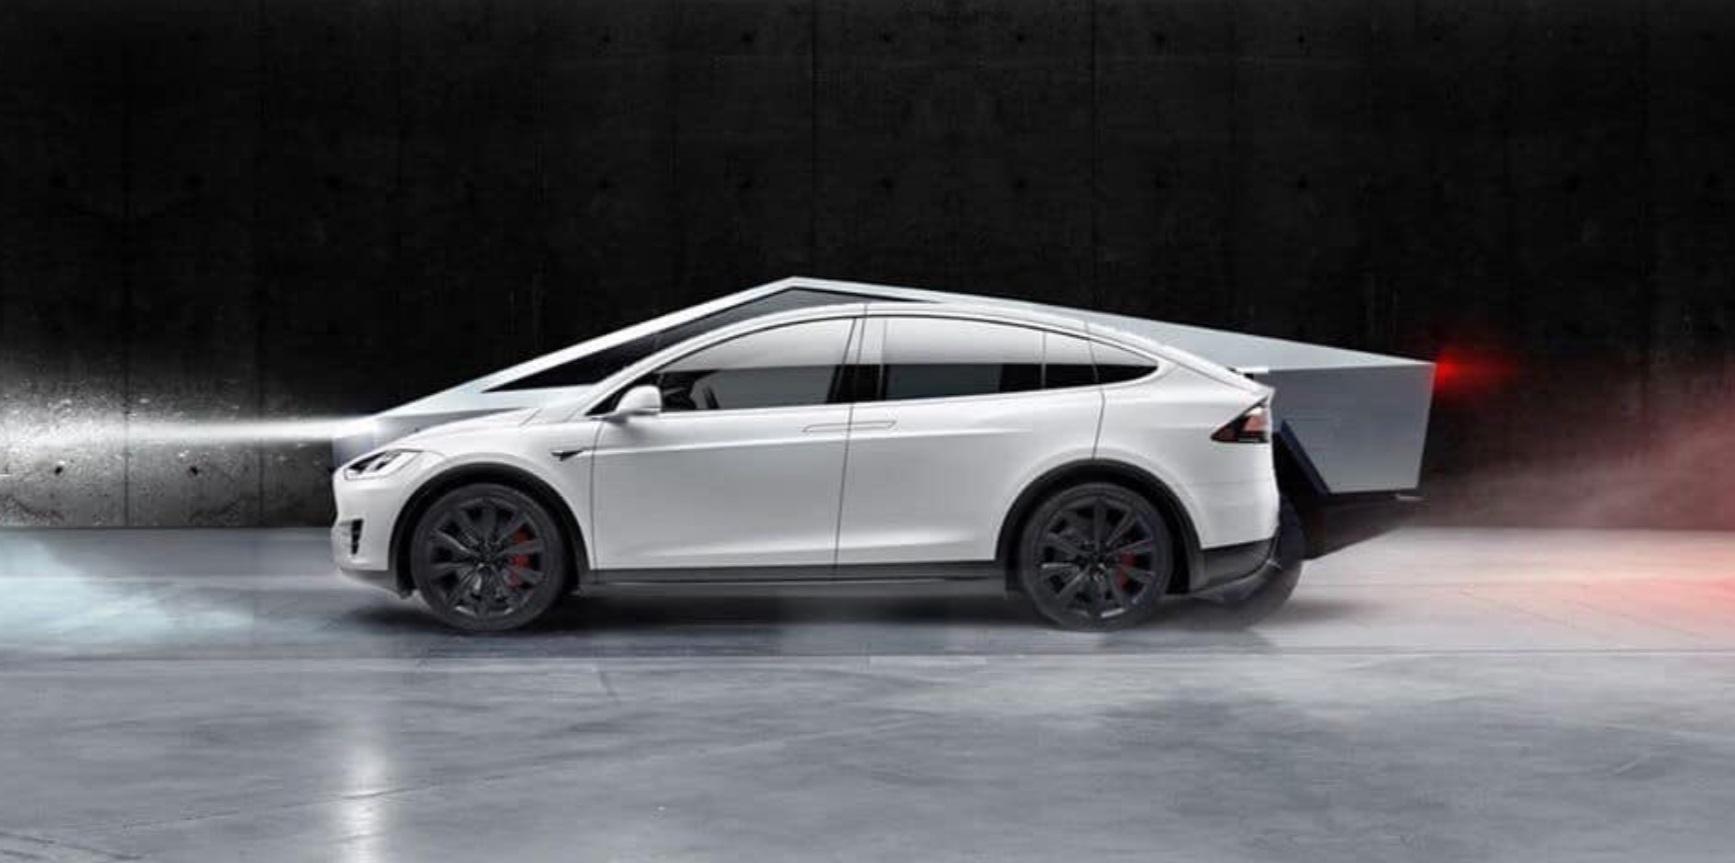 Tesla Cybertruck - Page 3 PHOTOS-Tesla-CyberTruck-Size-comparison-Vs-Model-S-3